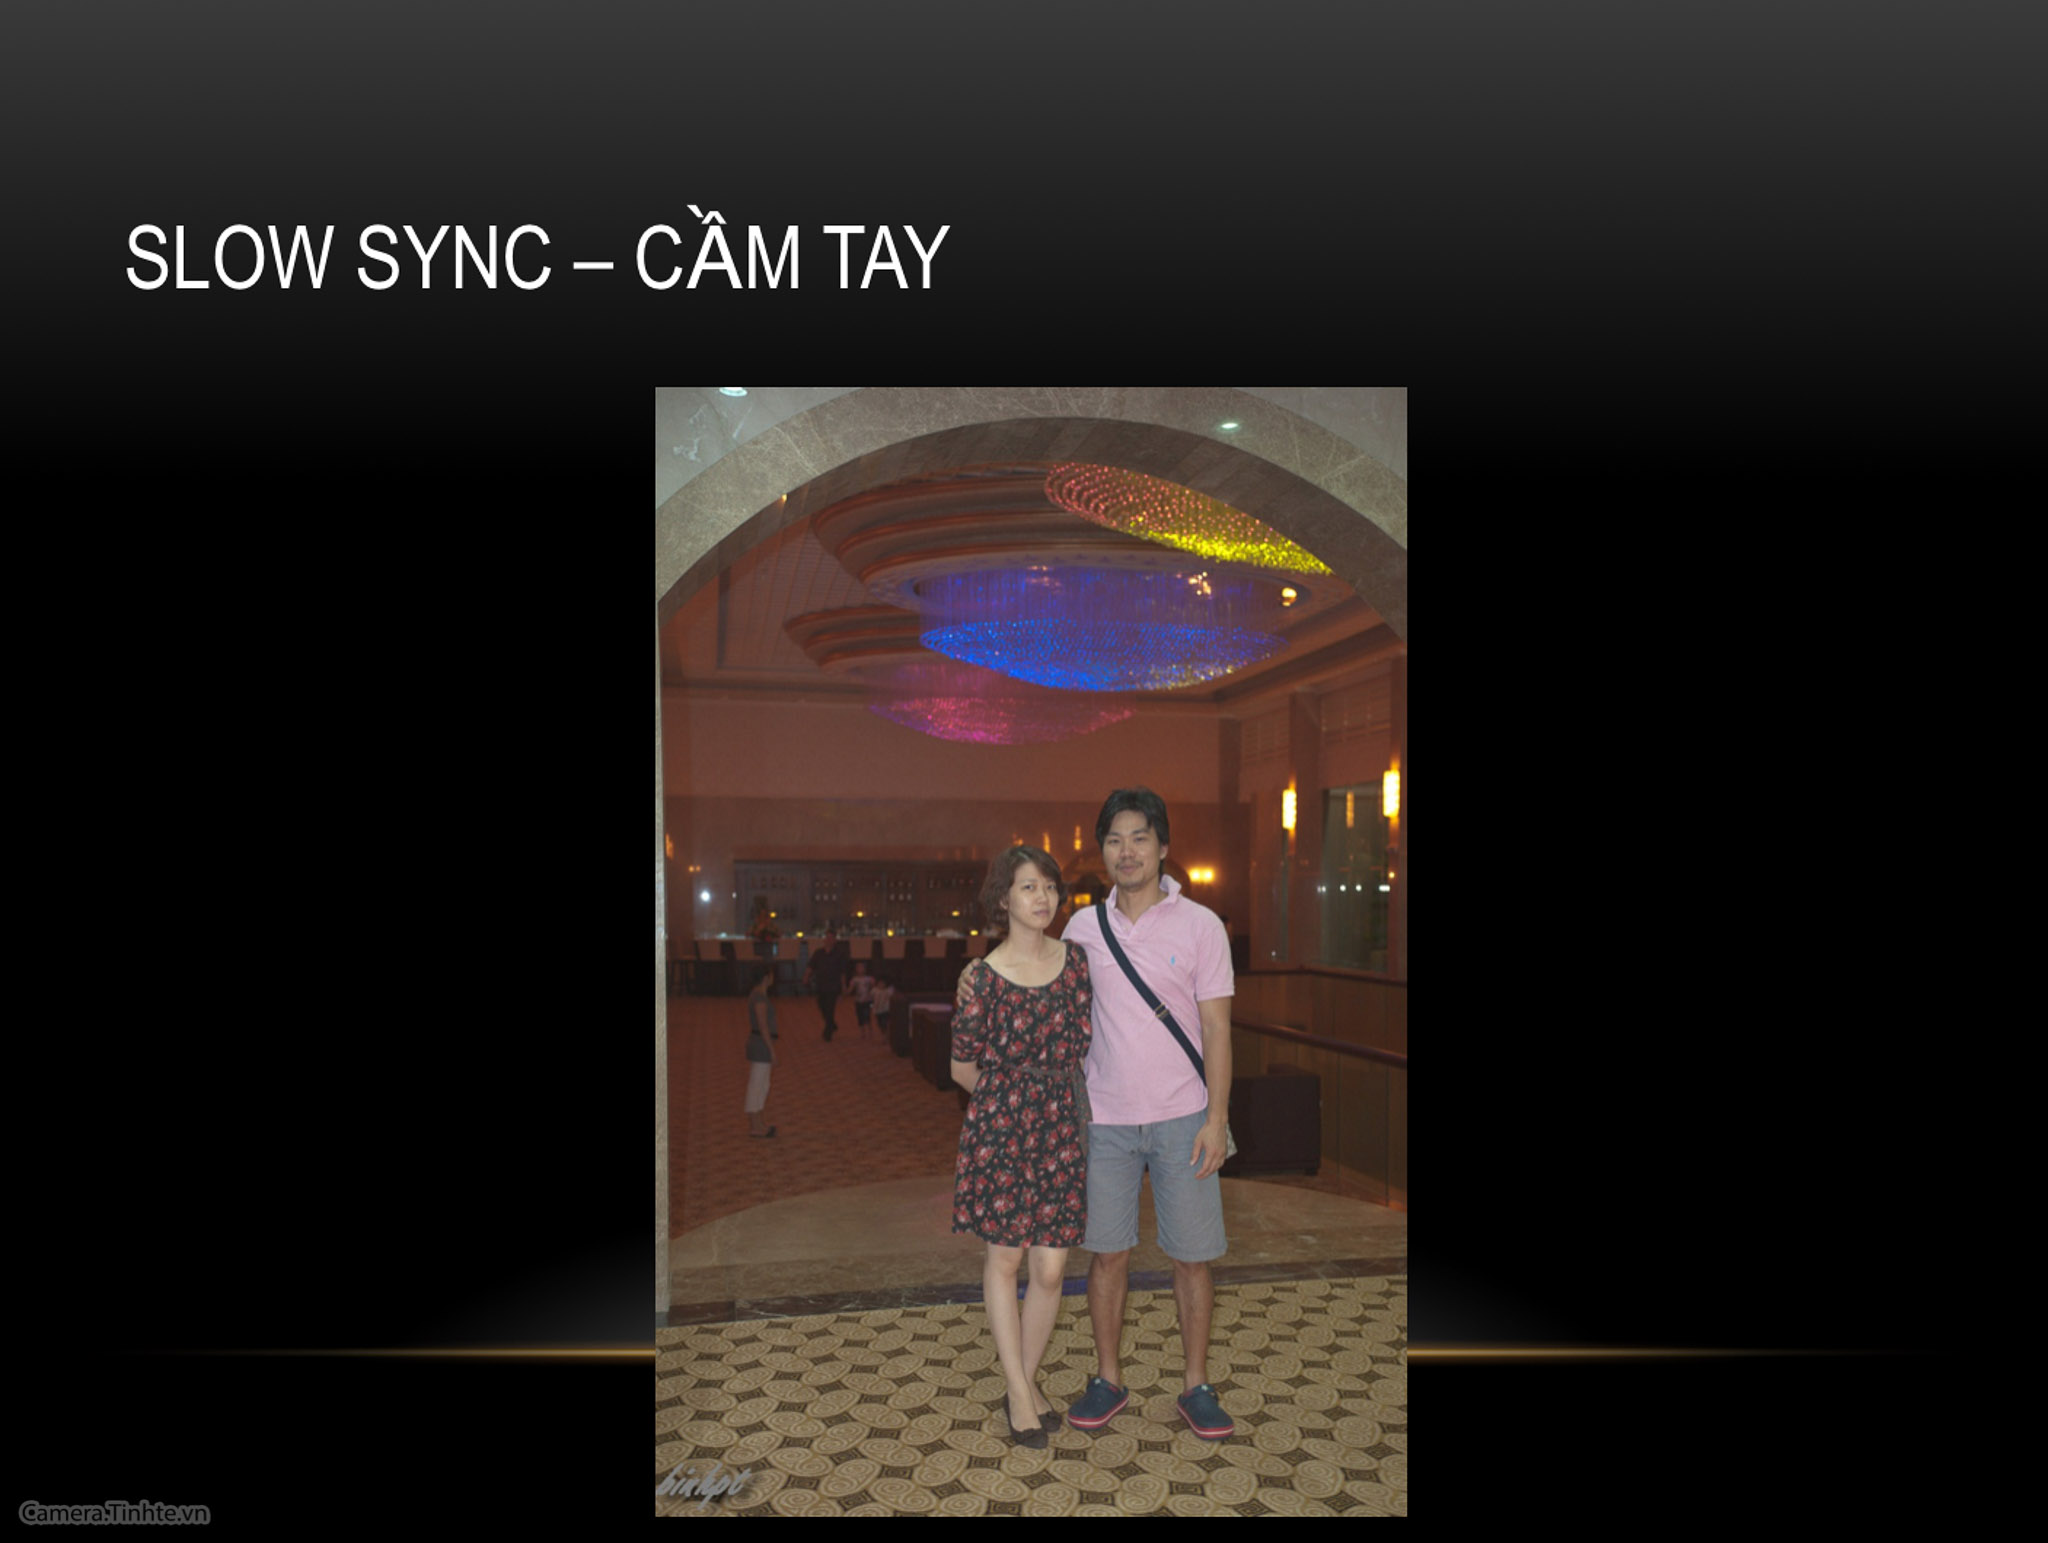 NACB 3 - Flash 1 - Camera.tinhte.vn-11.jpg